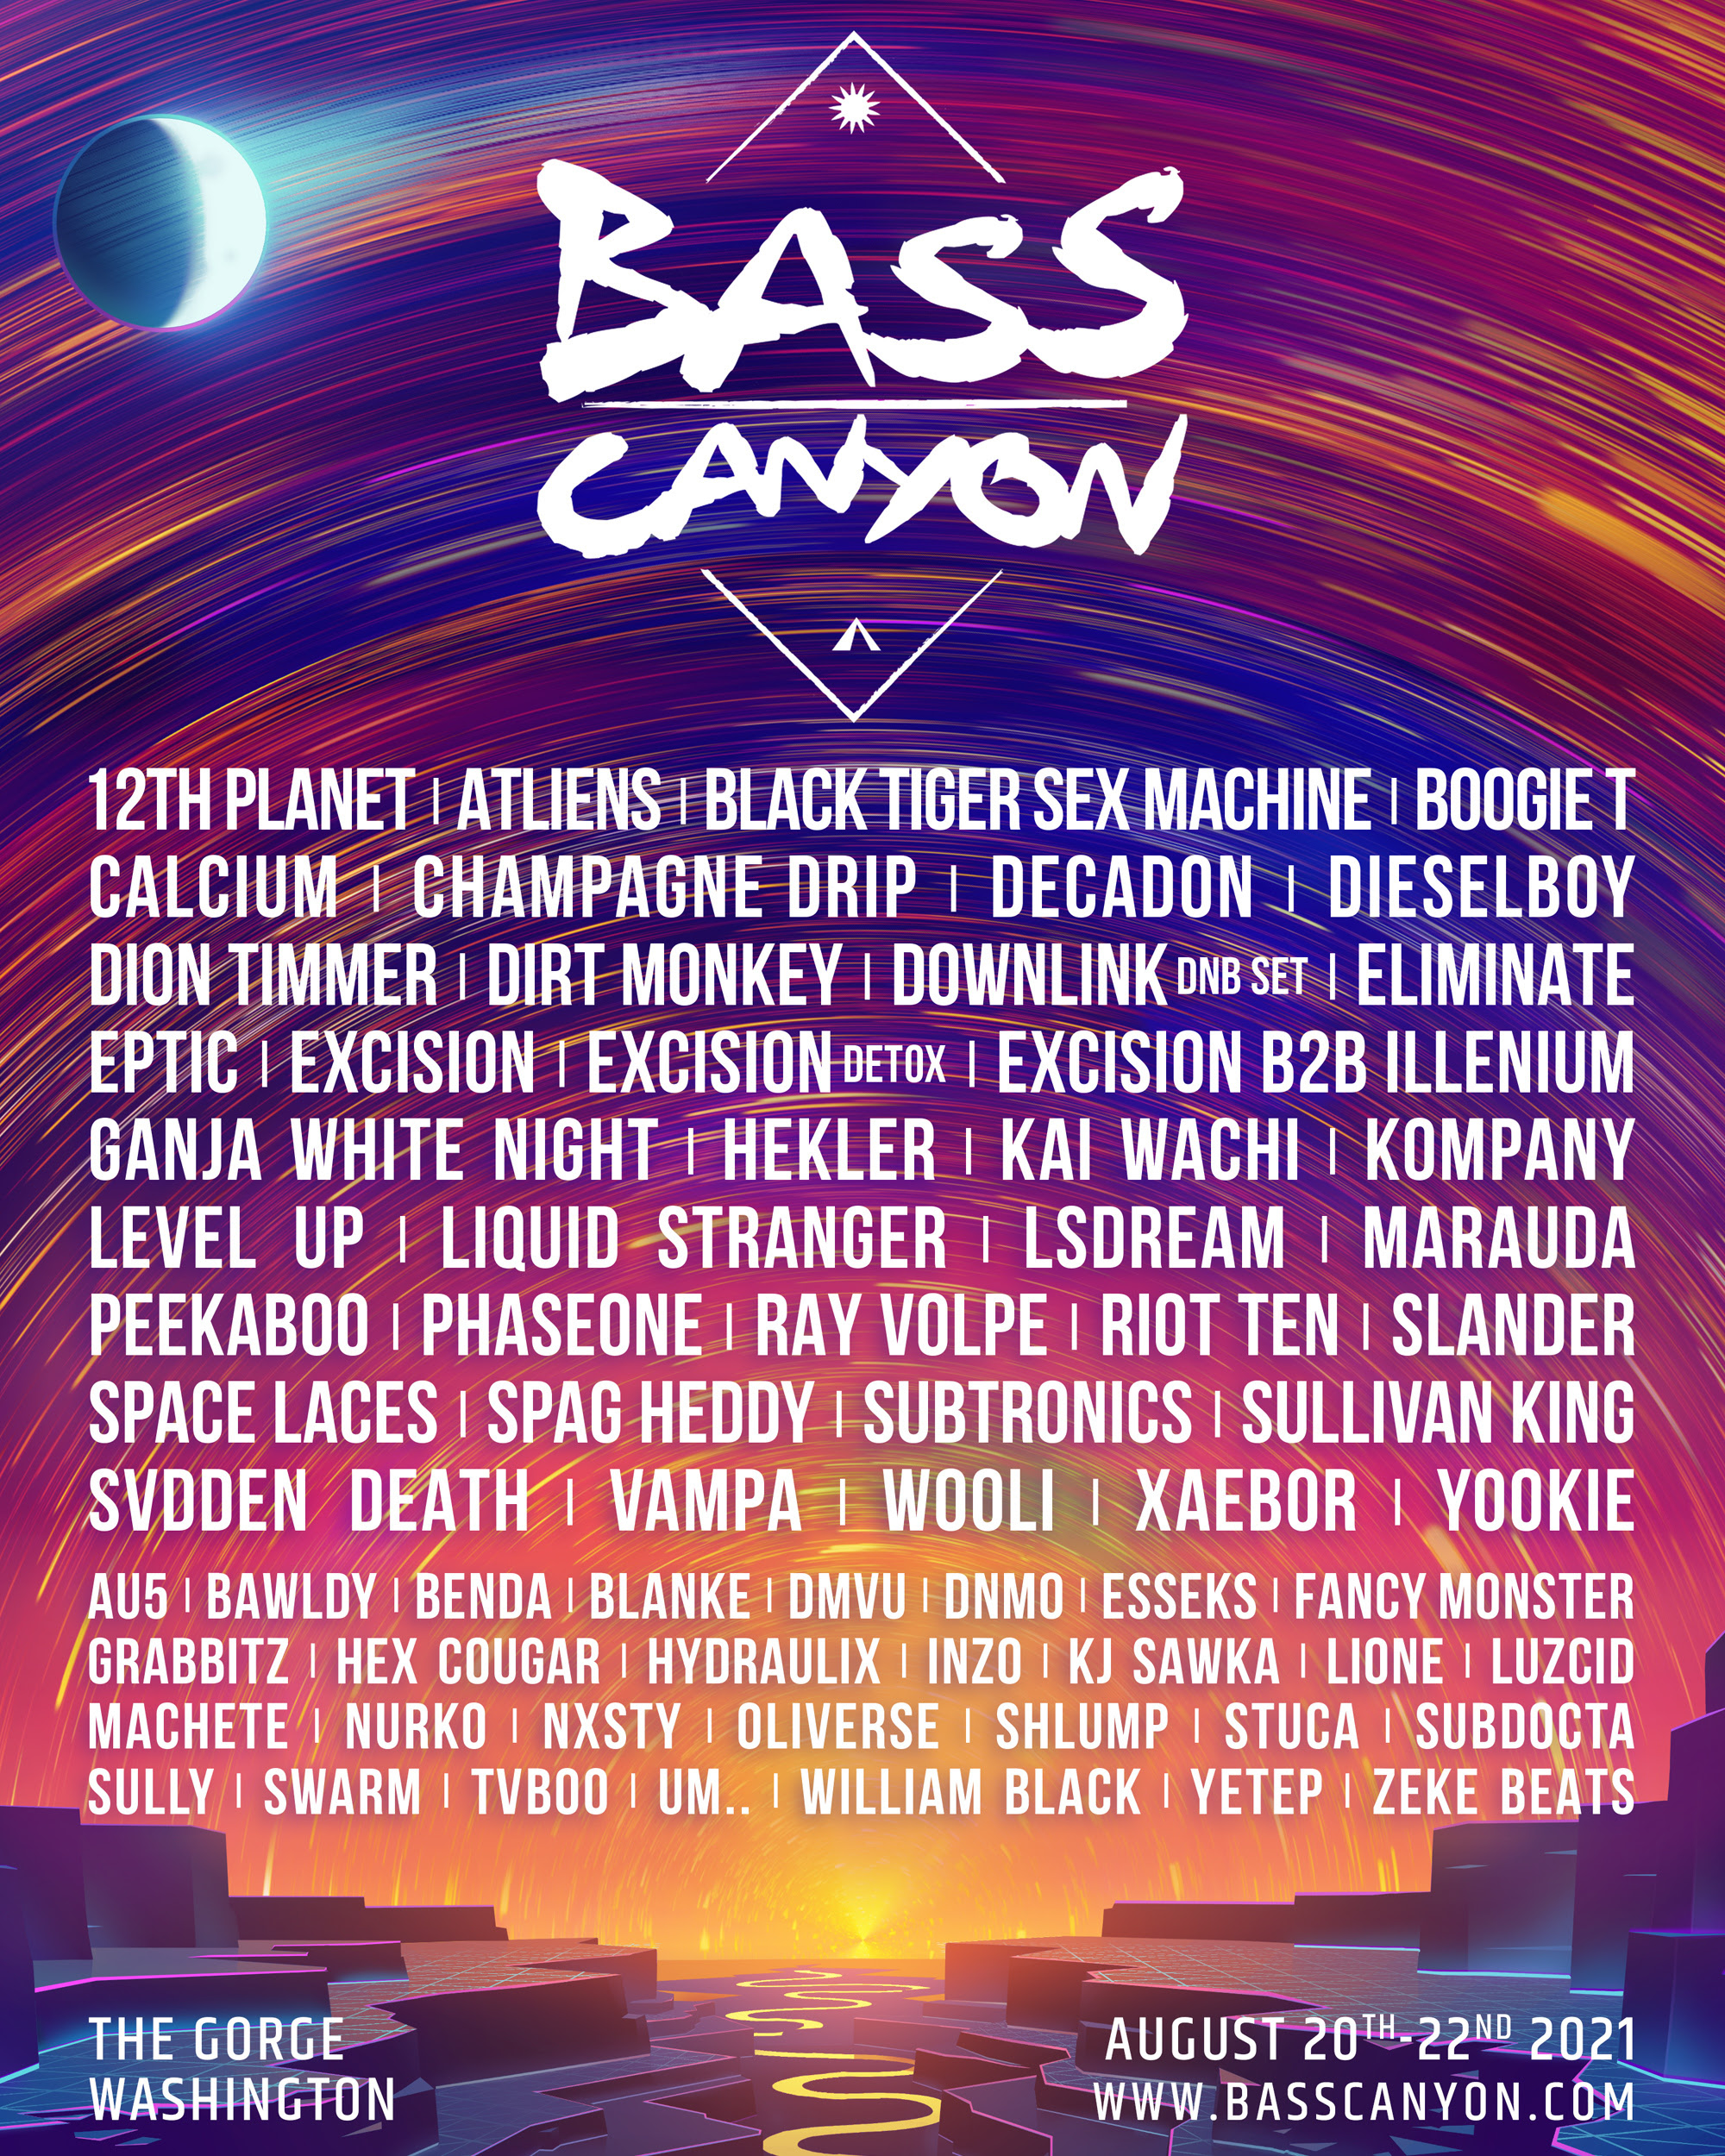 Bass Canyon Festival